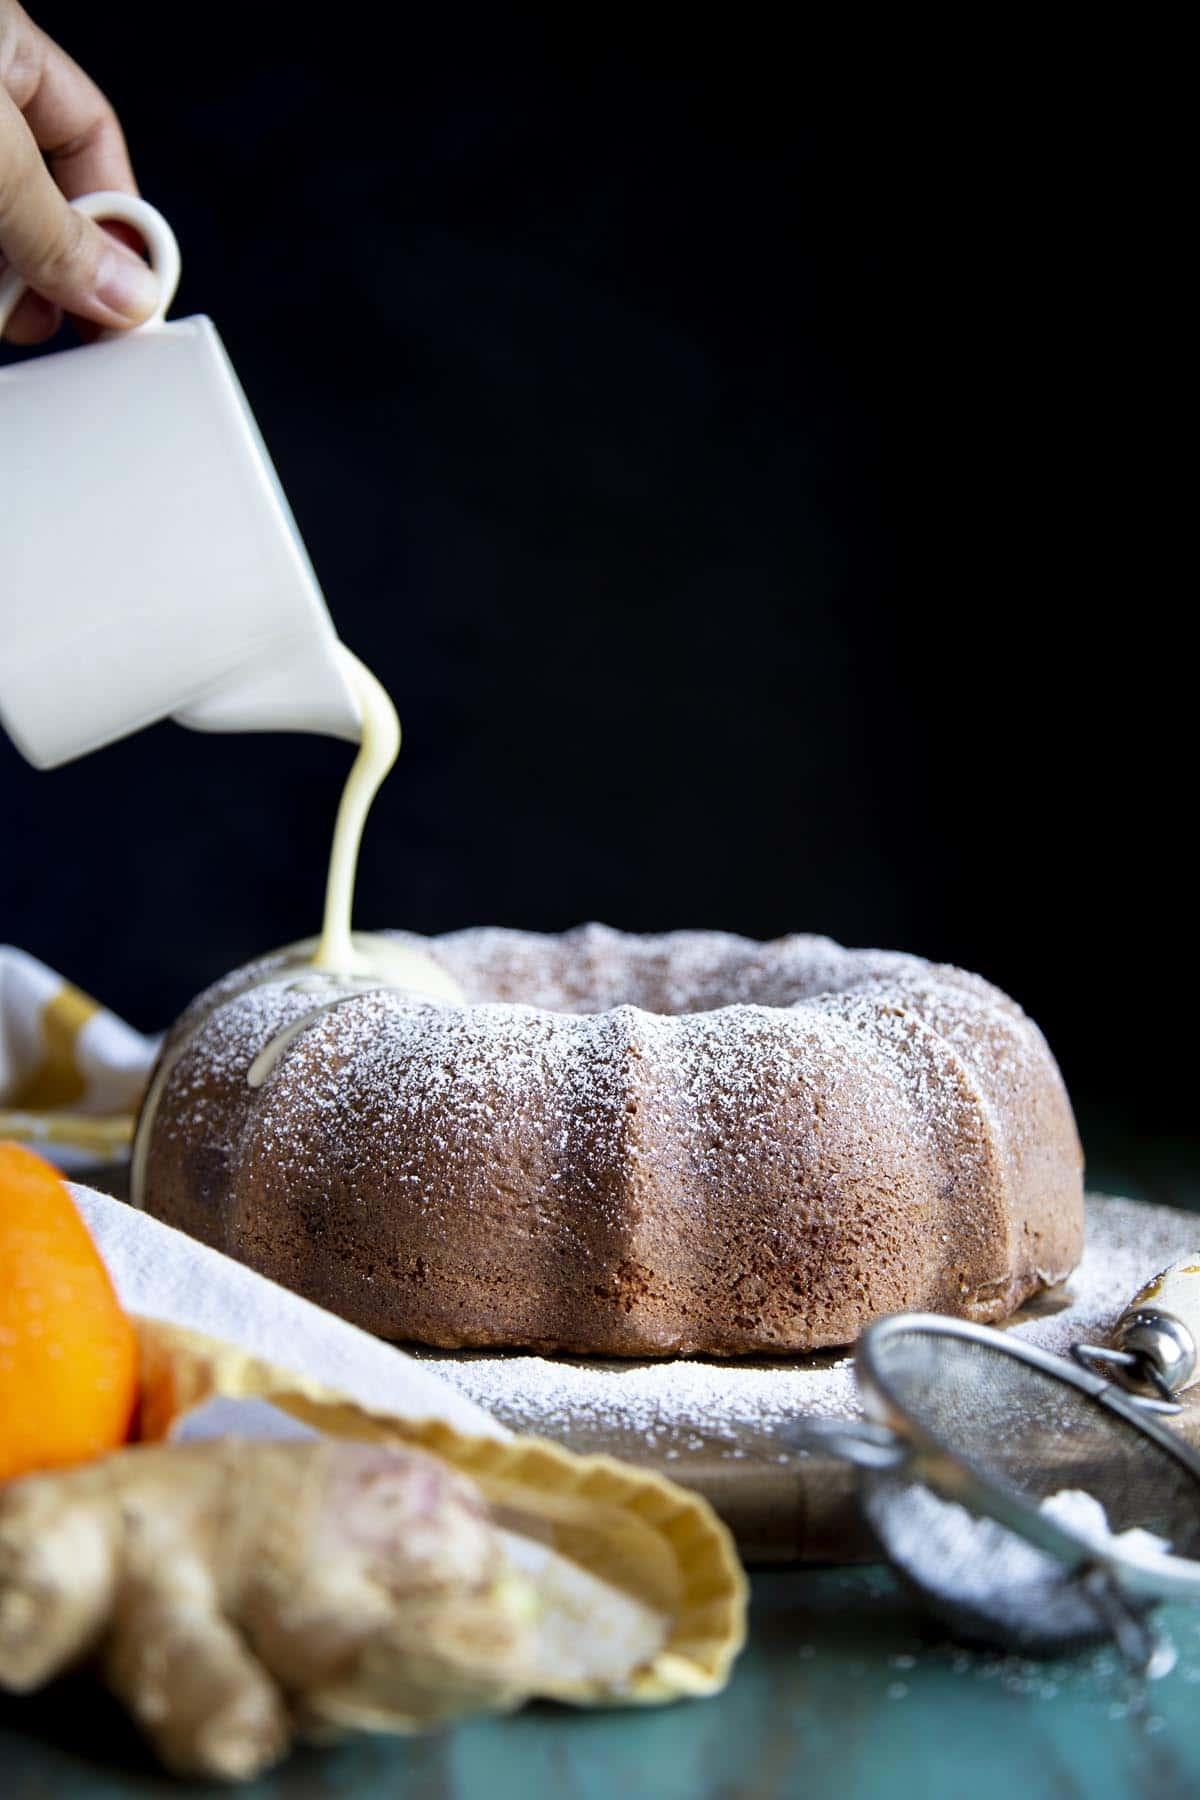 Orange glaze is being poured on top of a gingerbread bundt cake